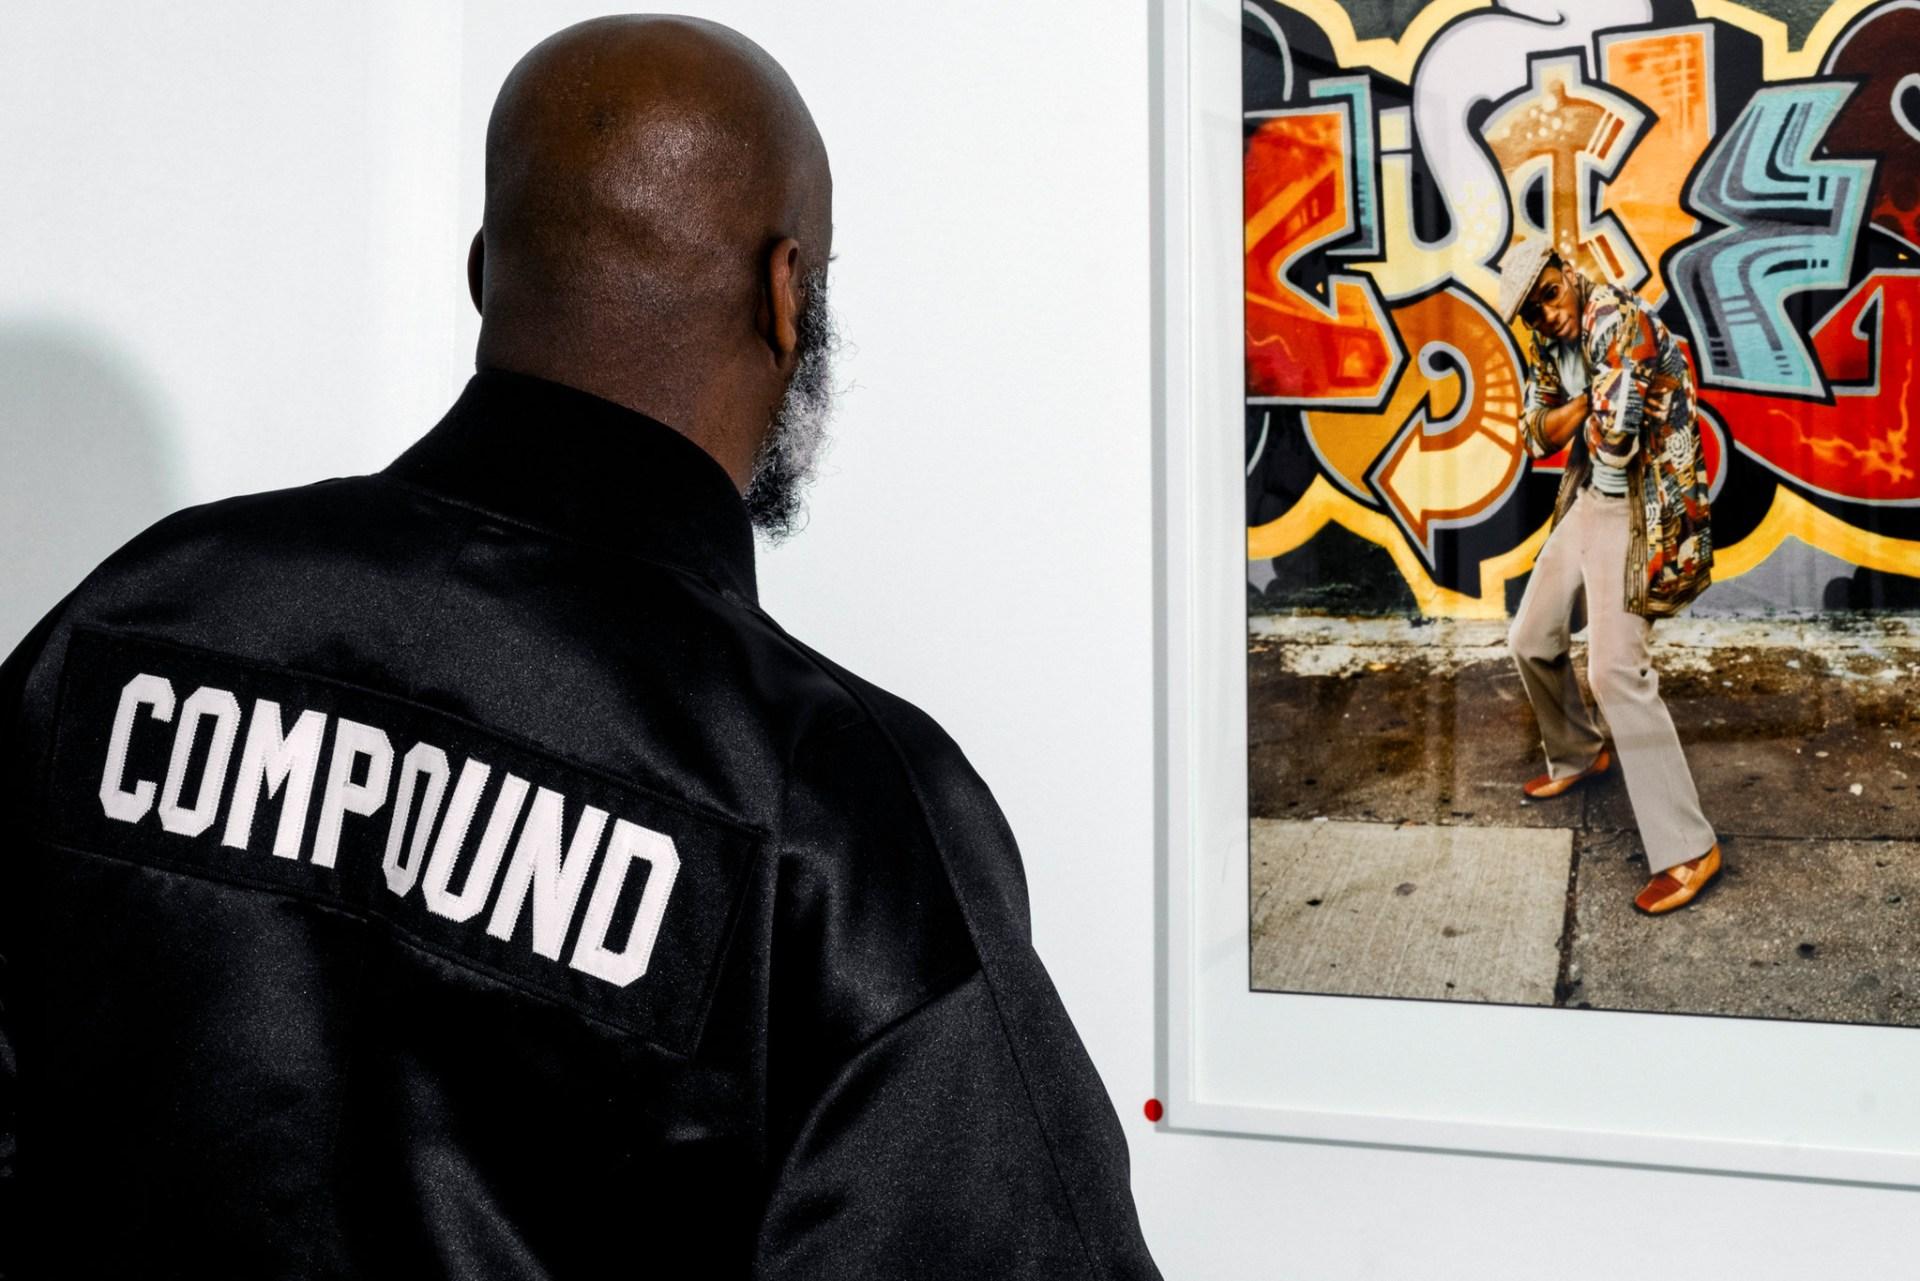 Free Richardson, The Compound, Hip Hop Gallery, African American Art, Black Art, KOLUMN Magazine, KOLUMN, KINDR'D Magazine, KINDR'D